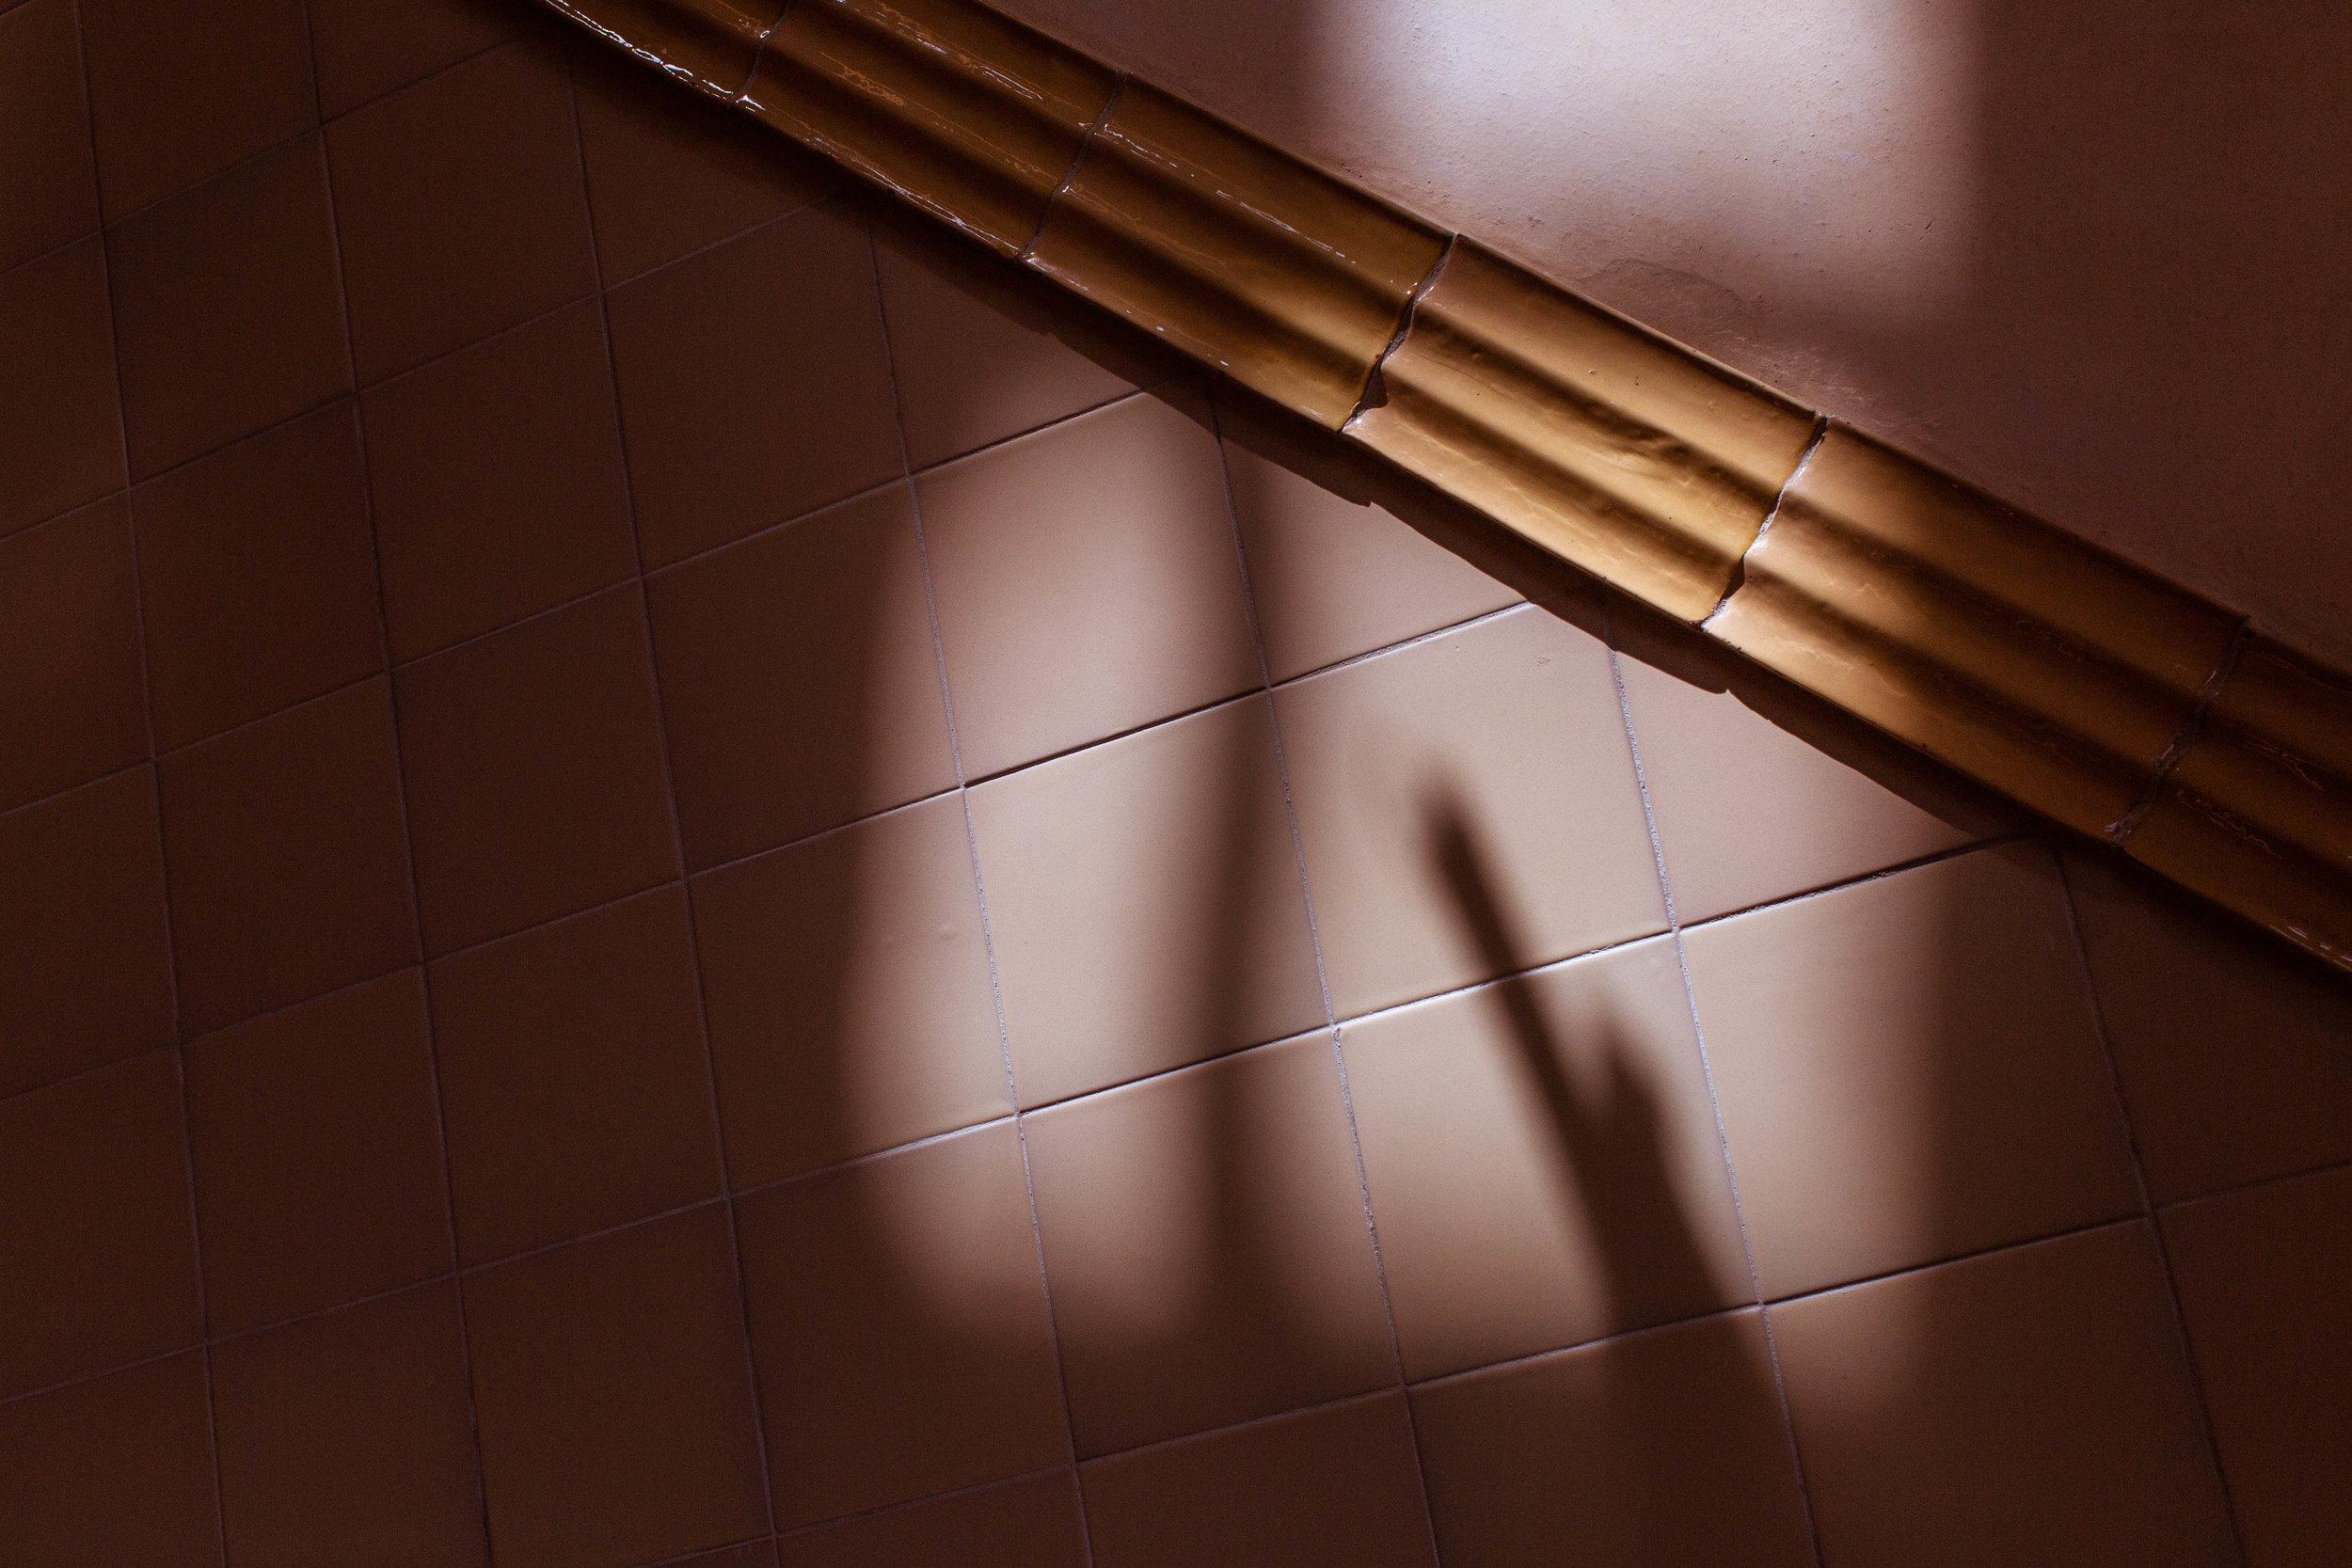 recinte mod shadows (1 of 1).jpg